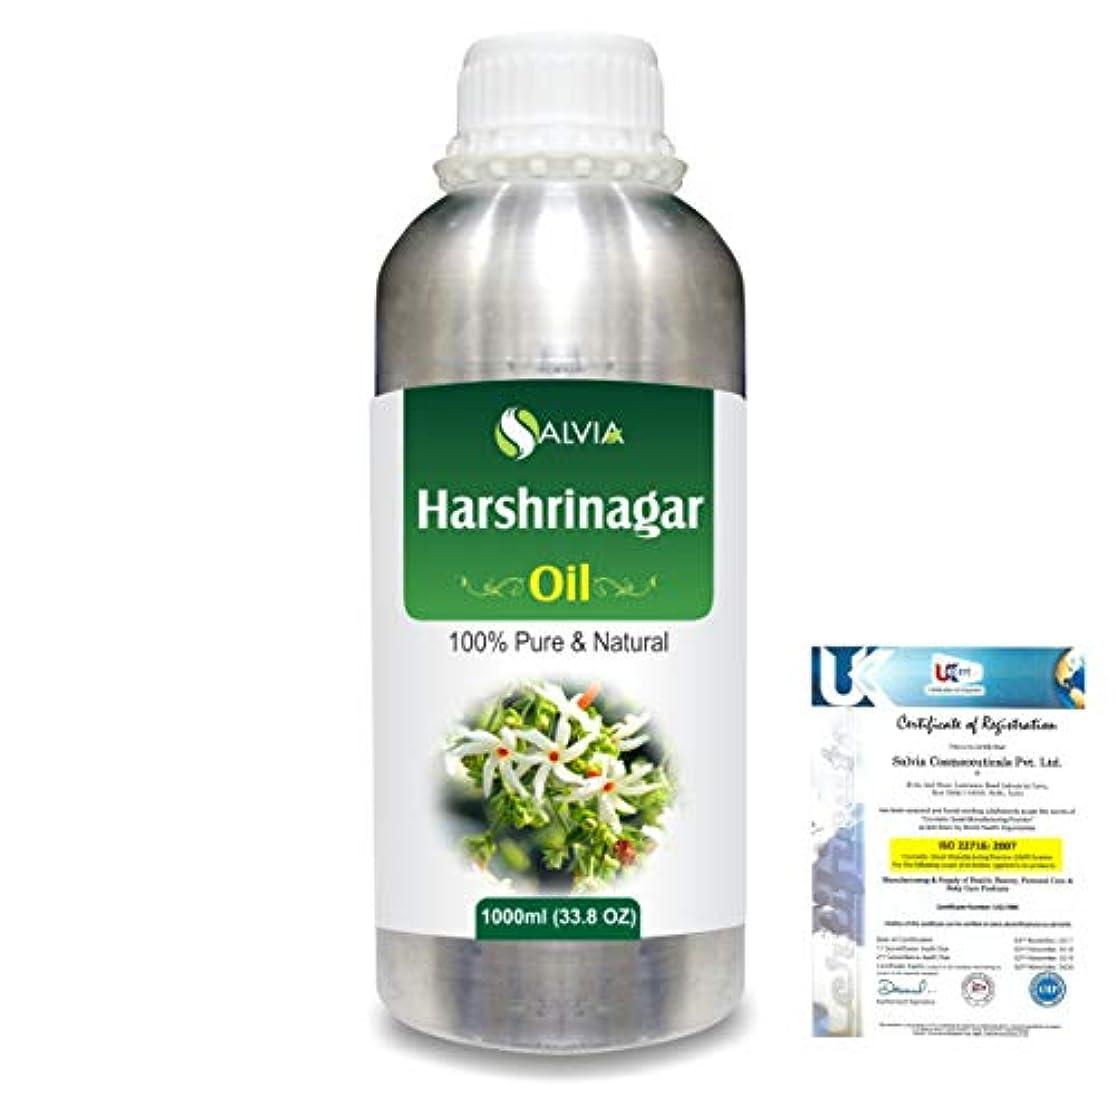 Harshringar (Nyctanthes arbor-tristis) 100% Natural Pure Essential Oil 1000ml/33.8fl.oz.